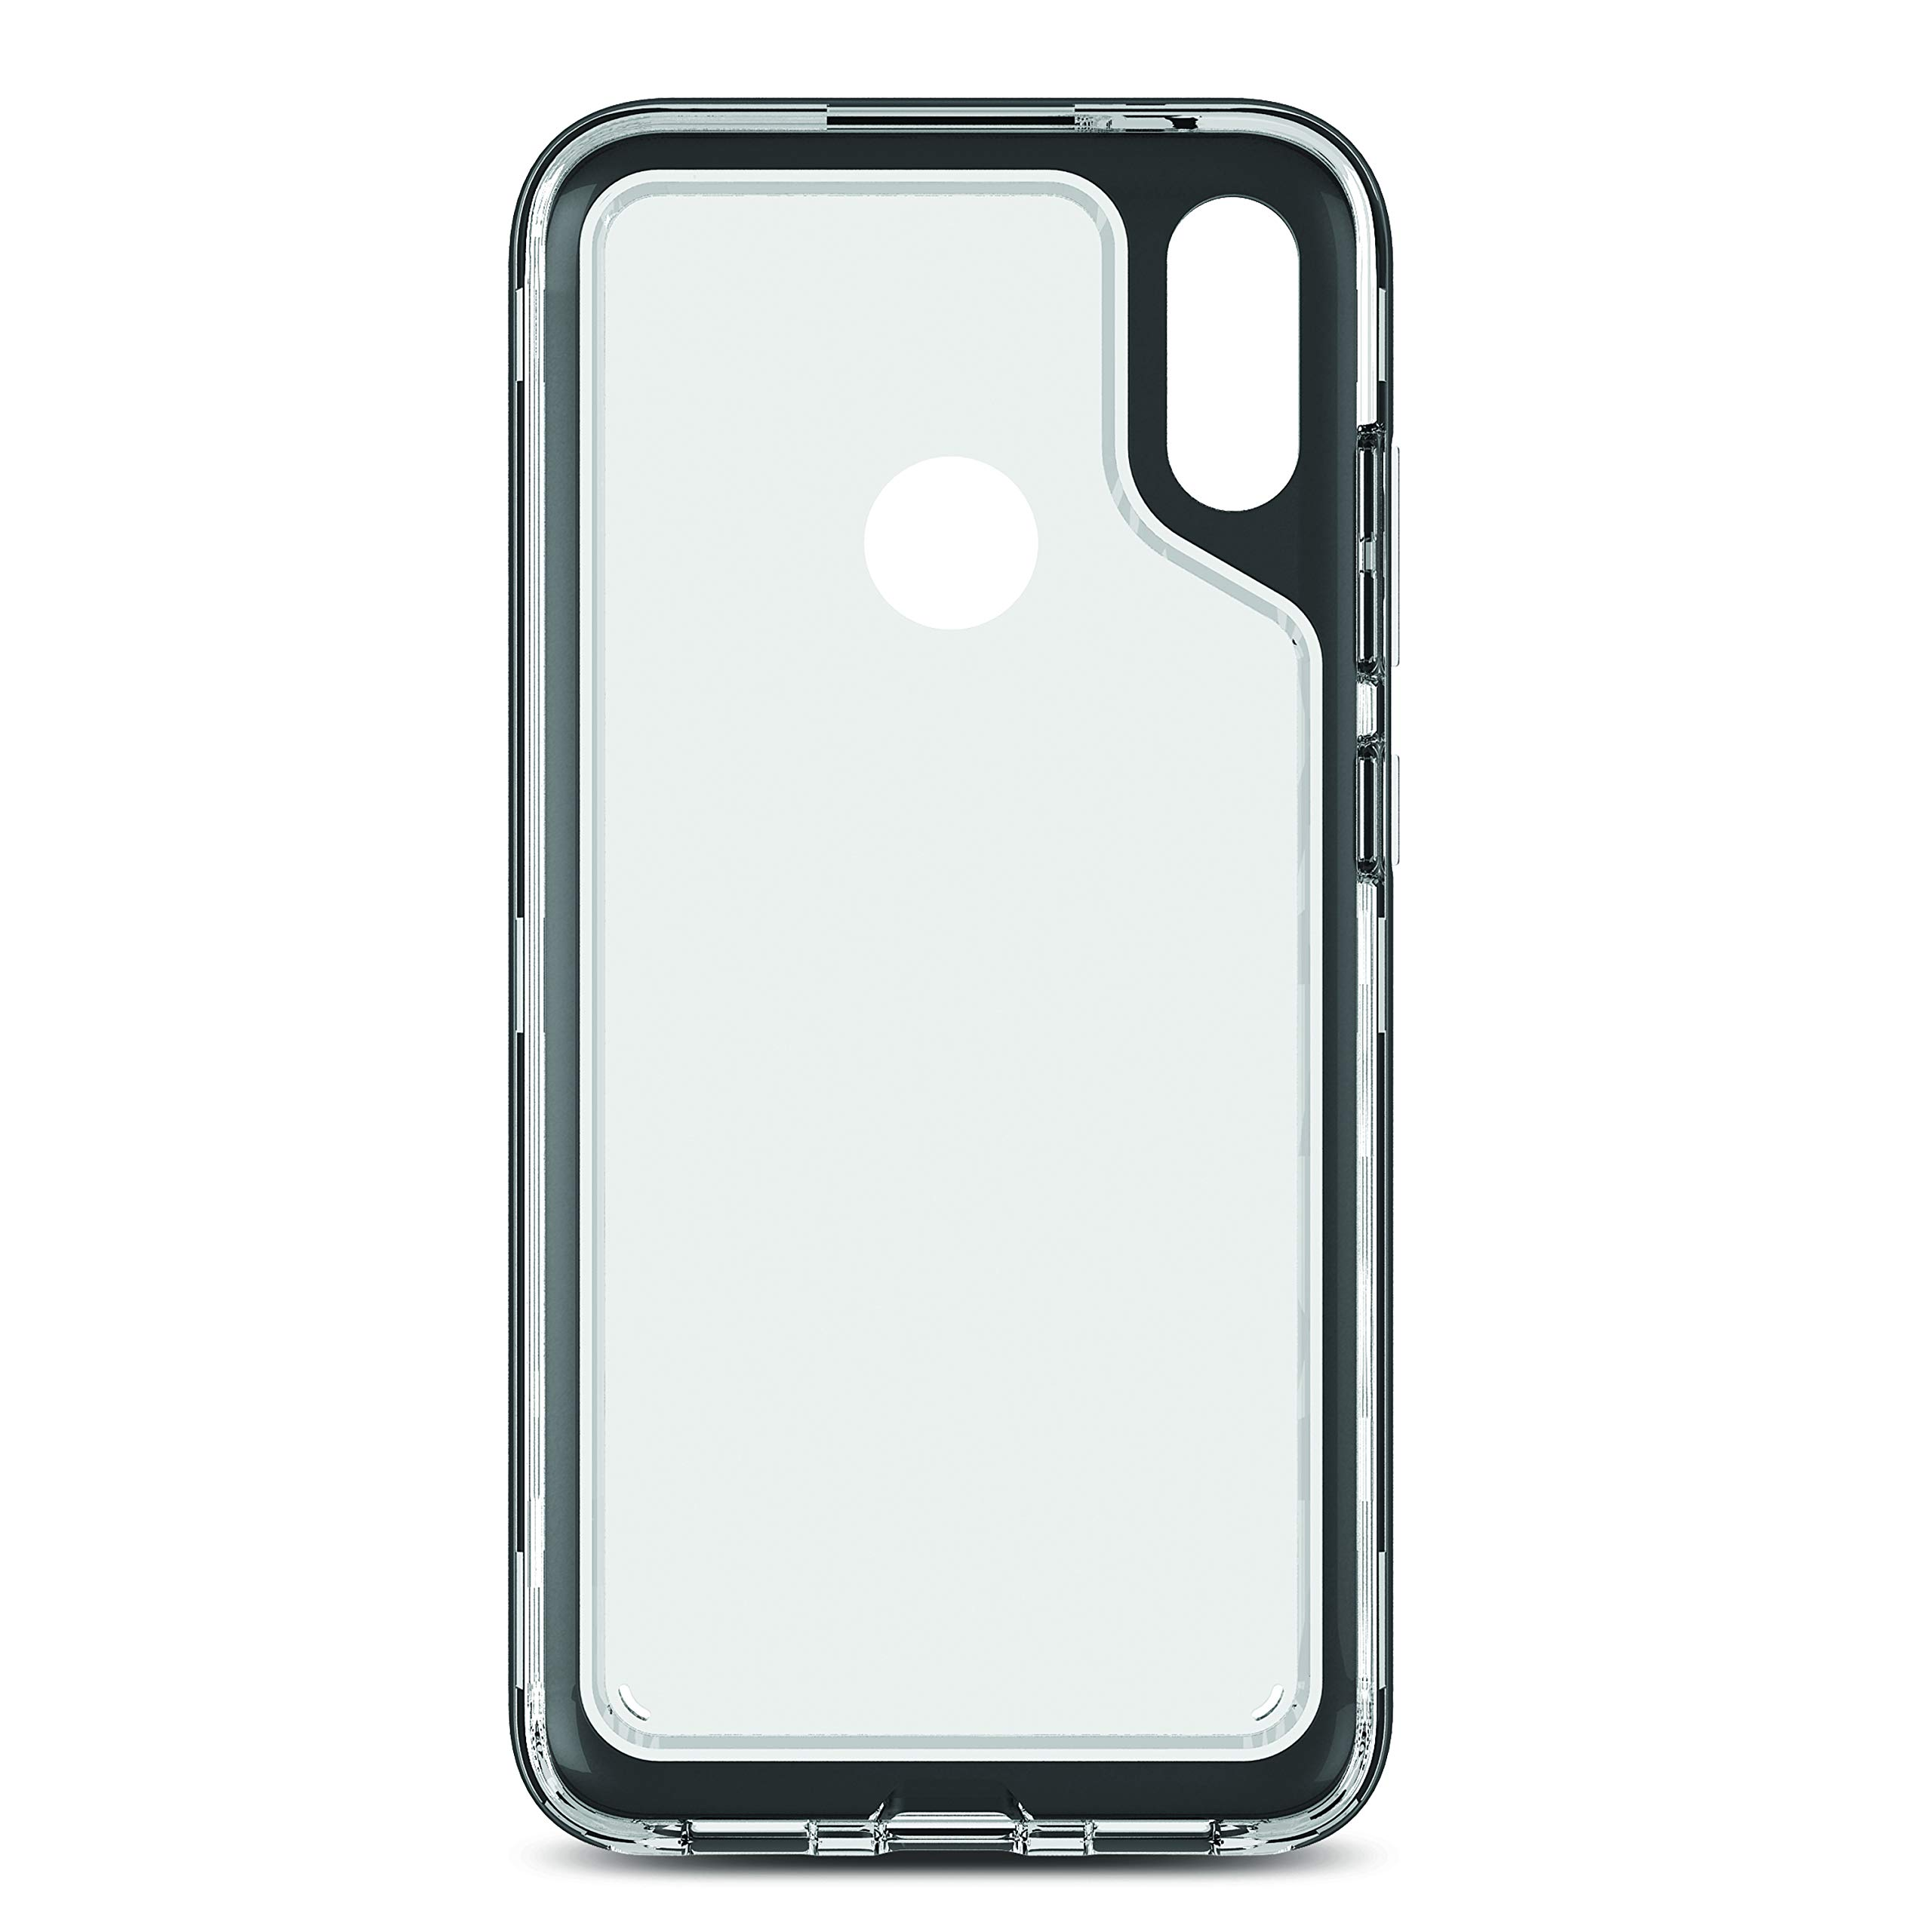 BLU X-Shield Series Hard Case for VIVO XI+ -Black by BLU